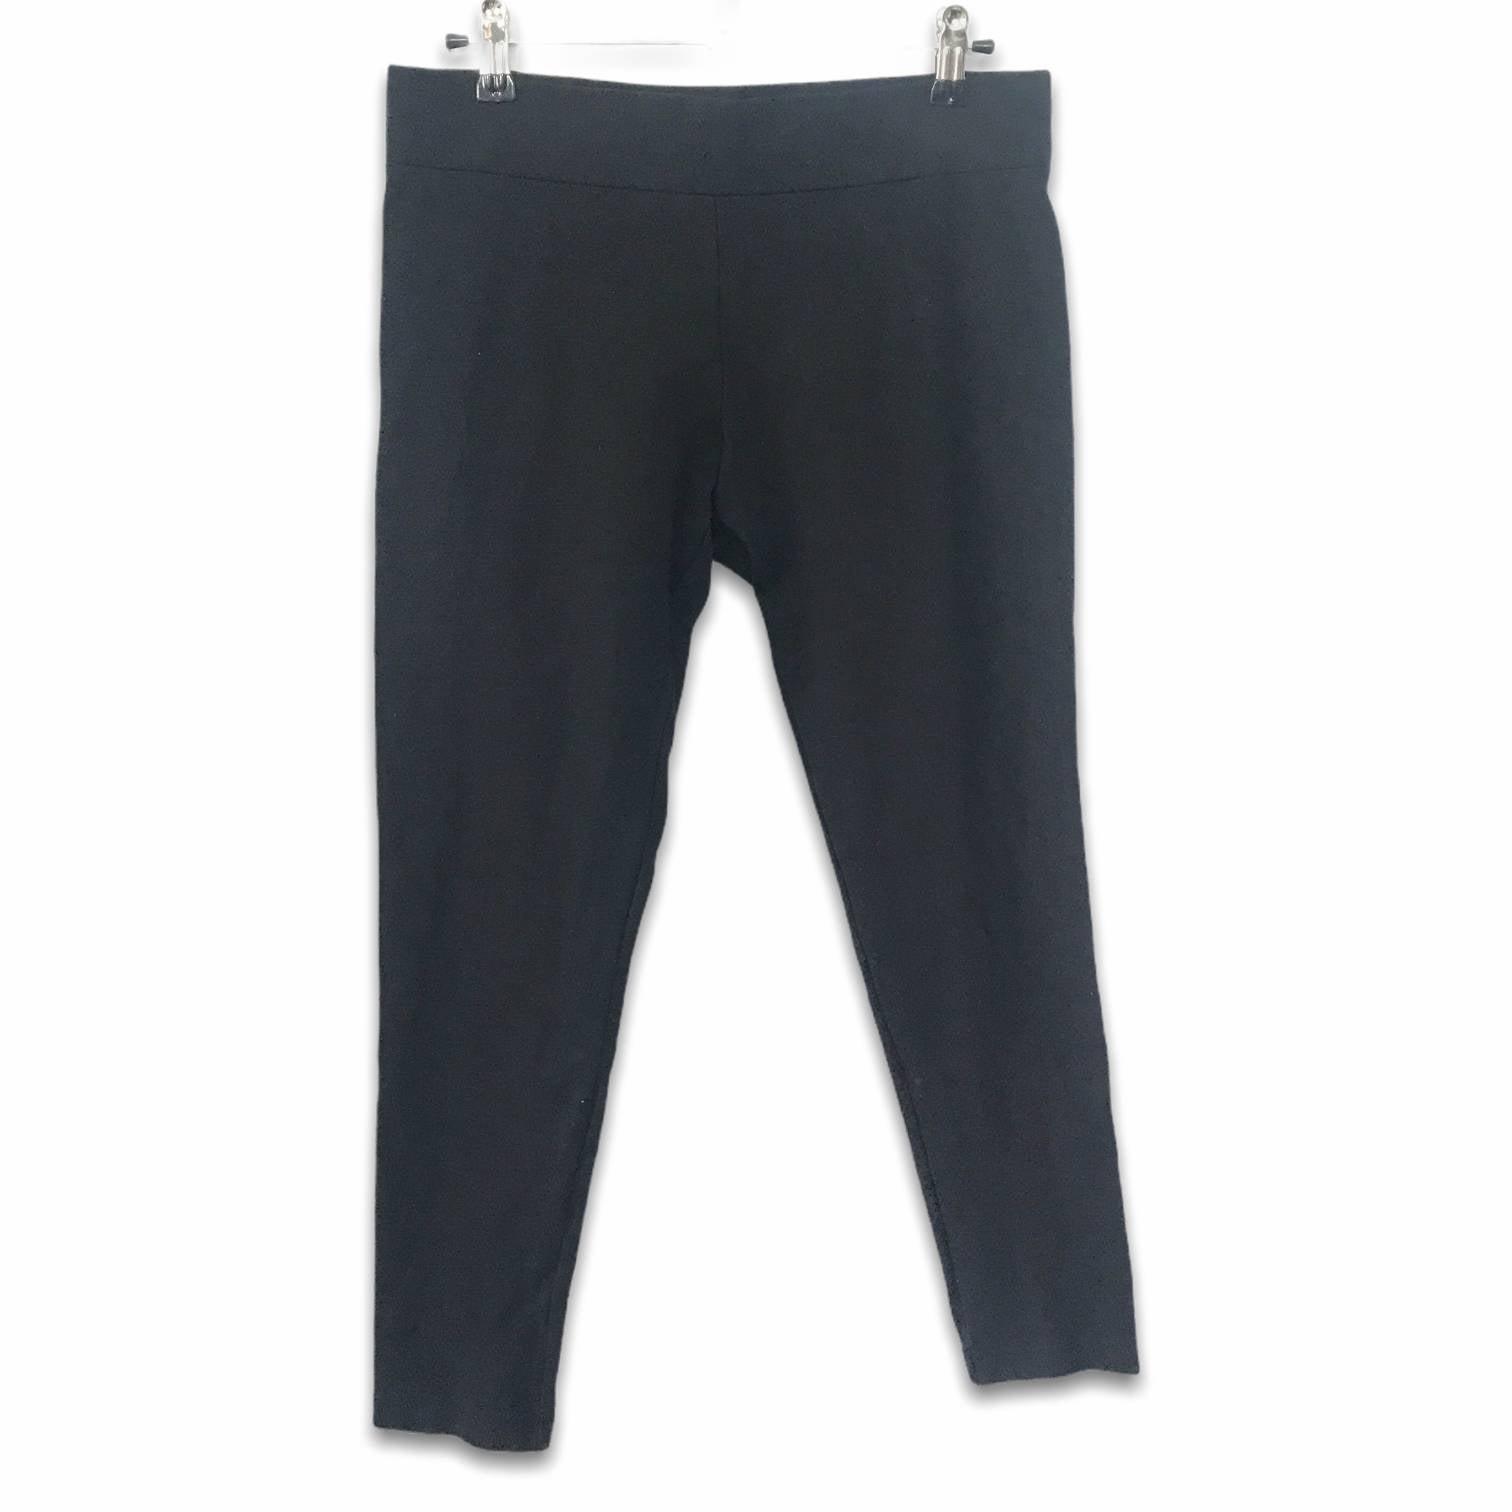 Black wide waistband cropped leggings